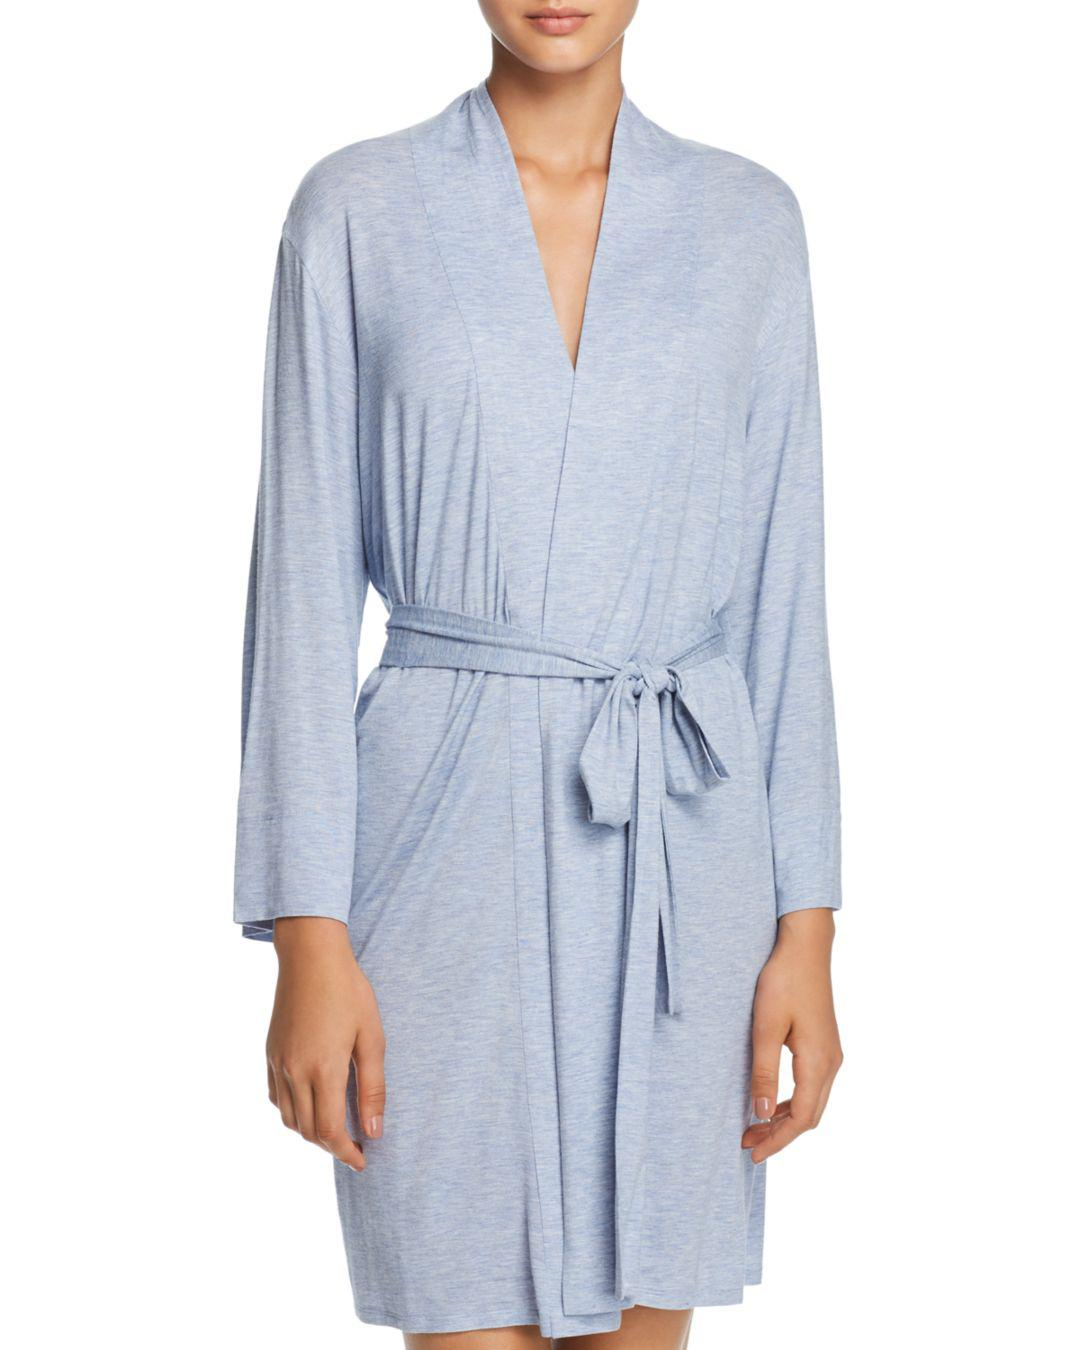 714e04cacd Lyst - Natori Feathers Essentials Wrap Robe in Blue